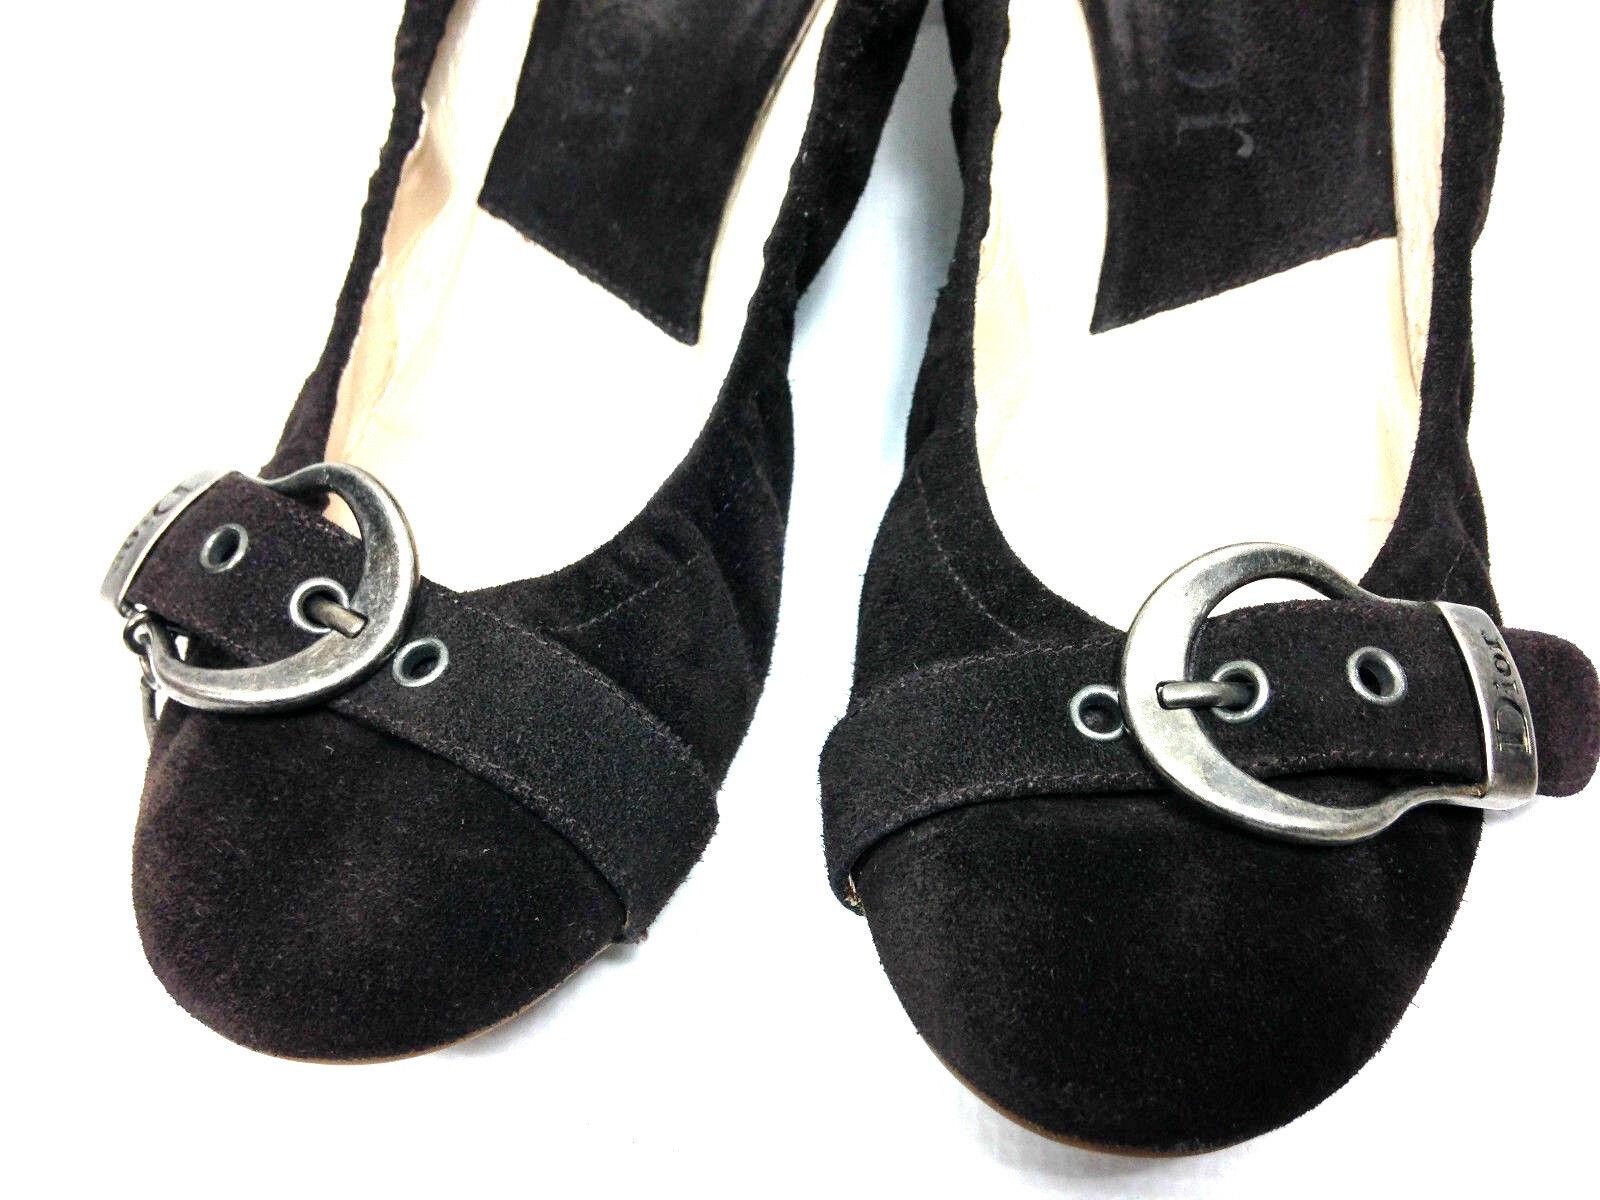 Dior Flat Casual Brow US.6-6.5 Suede Woman's Schuhes Größe US.6-6.5 Brow EU.36.5 ca9ab8